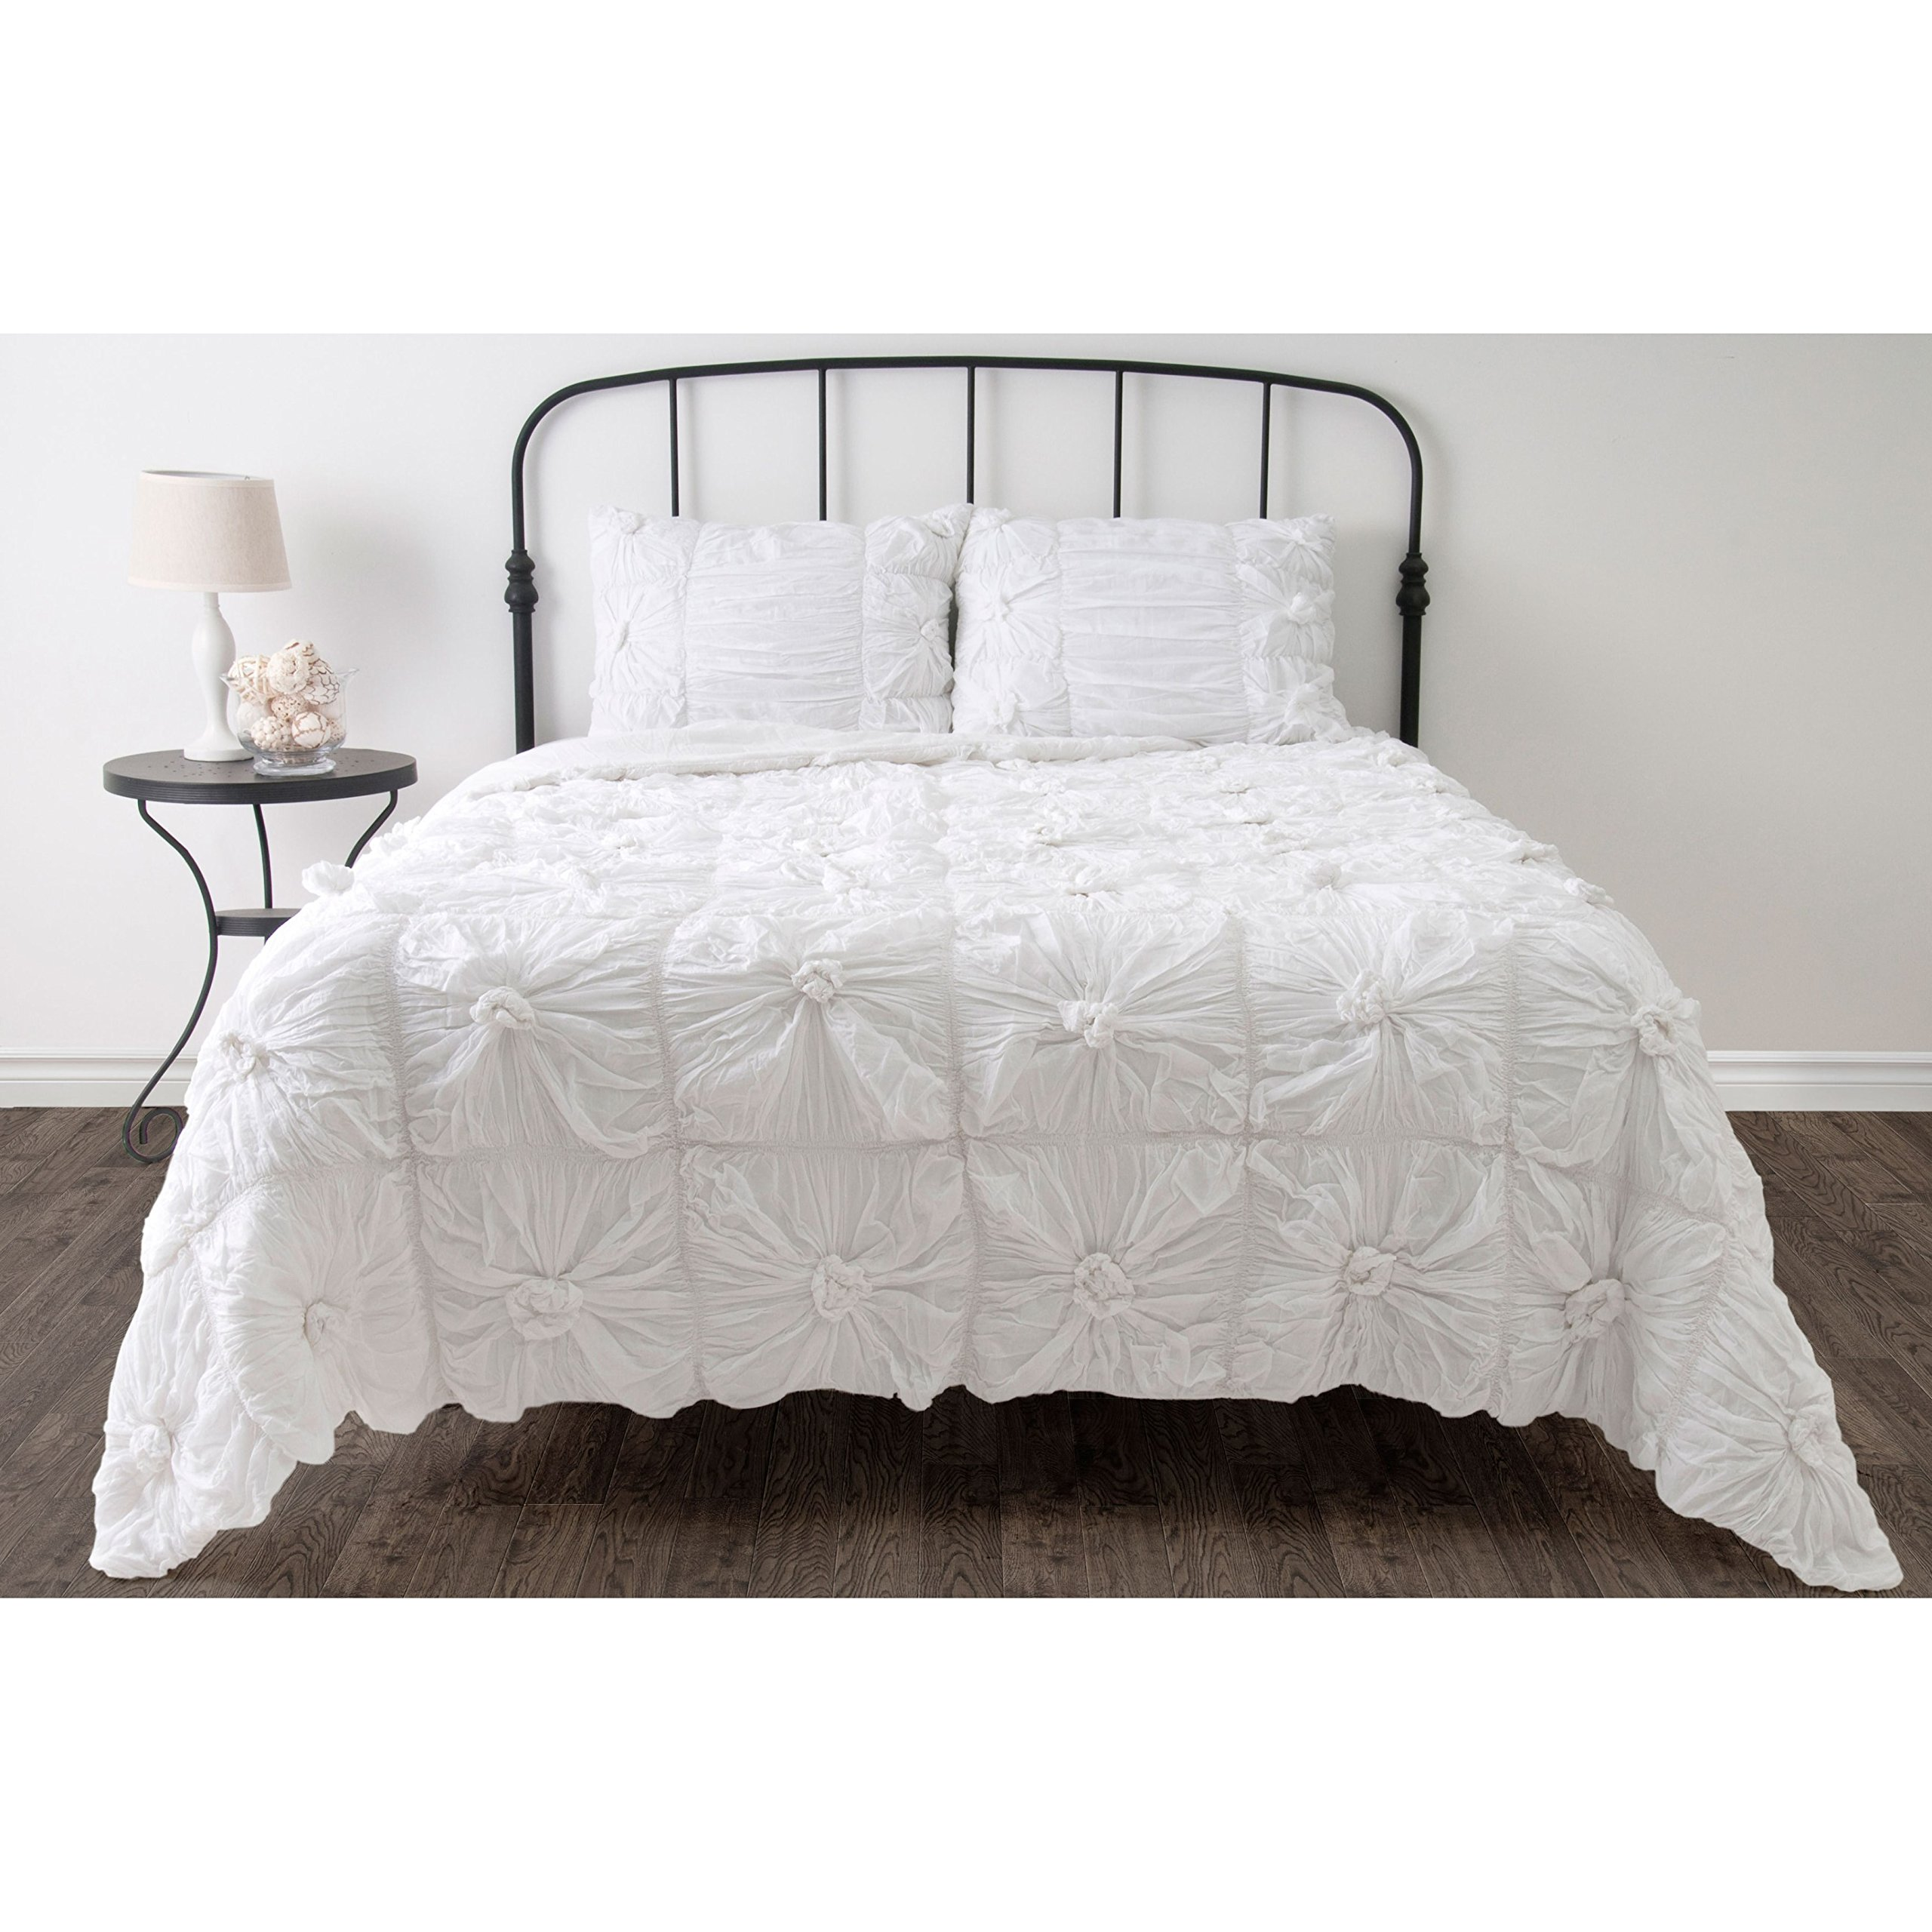 Rizzy Home Daydreamer 3-Piece Comforter Set, Queen